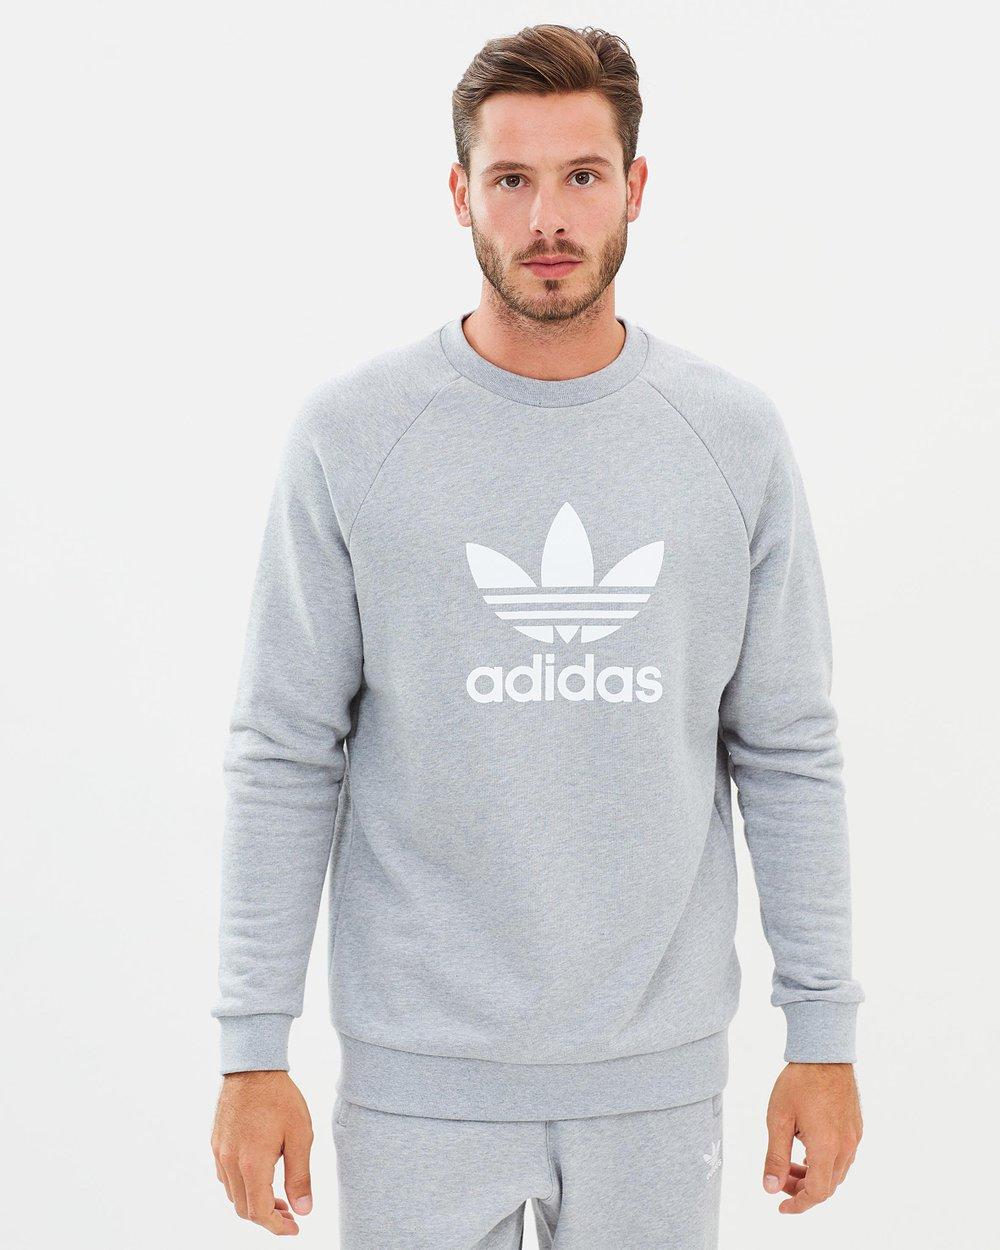 a590dbda Adicolor Trefoil Crew Sweatshirt by adidas Originals Online | THE ICONIC |  Australia